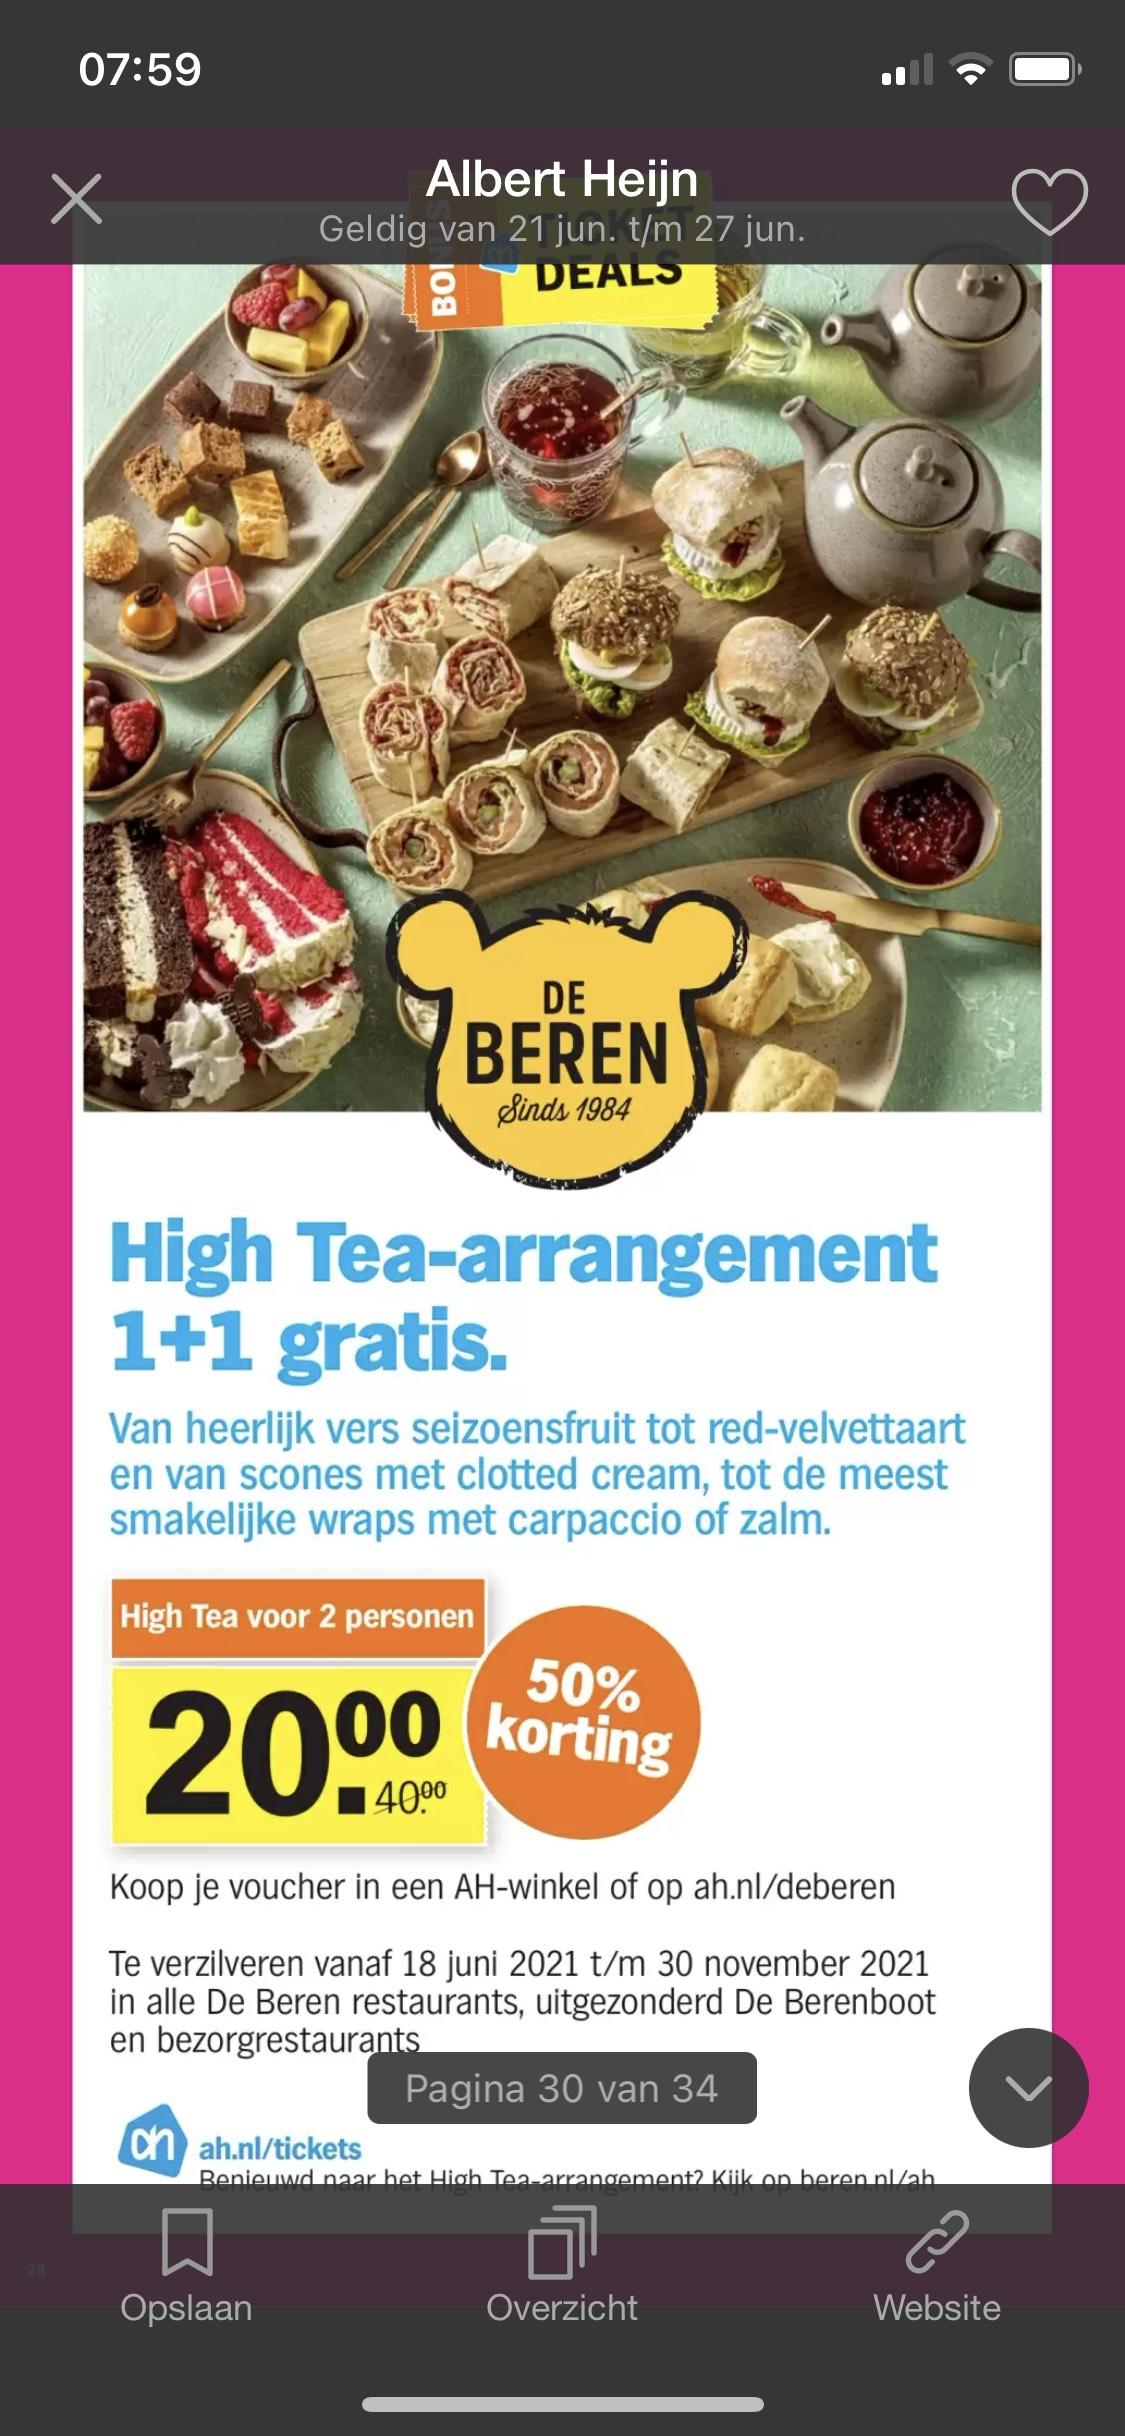 High-tea arrangement 1+1 gratis